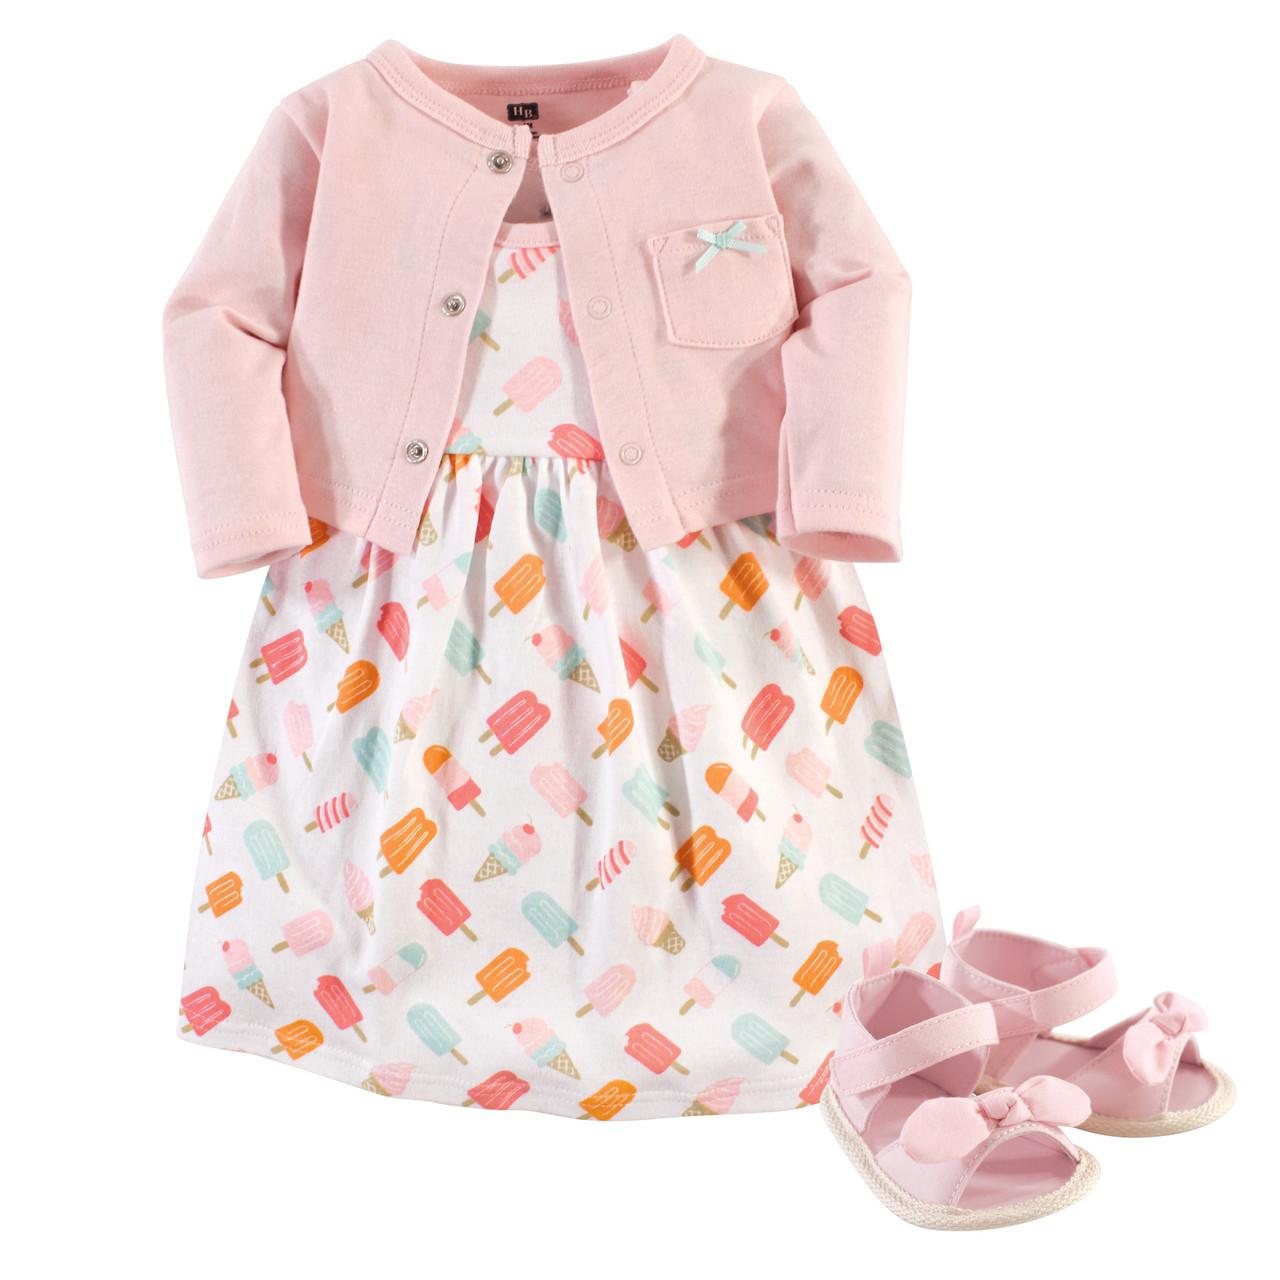 Hudson Baby Girls Cotton Dress and Cardigan Set